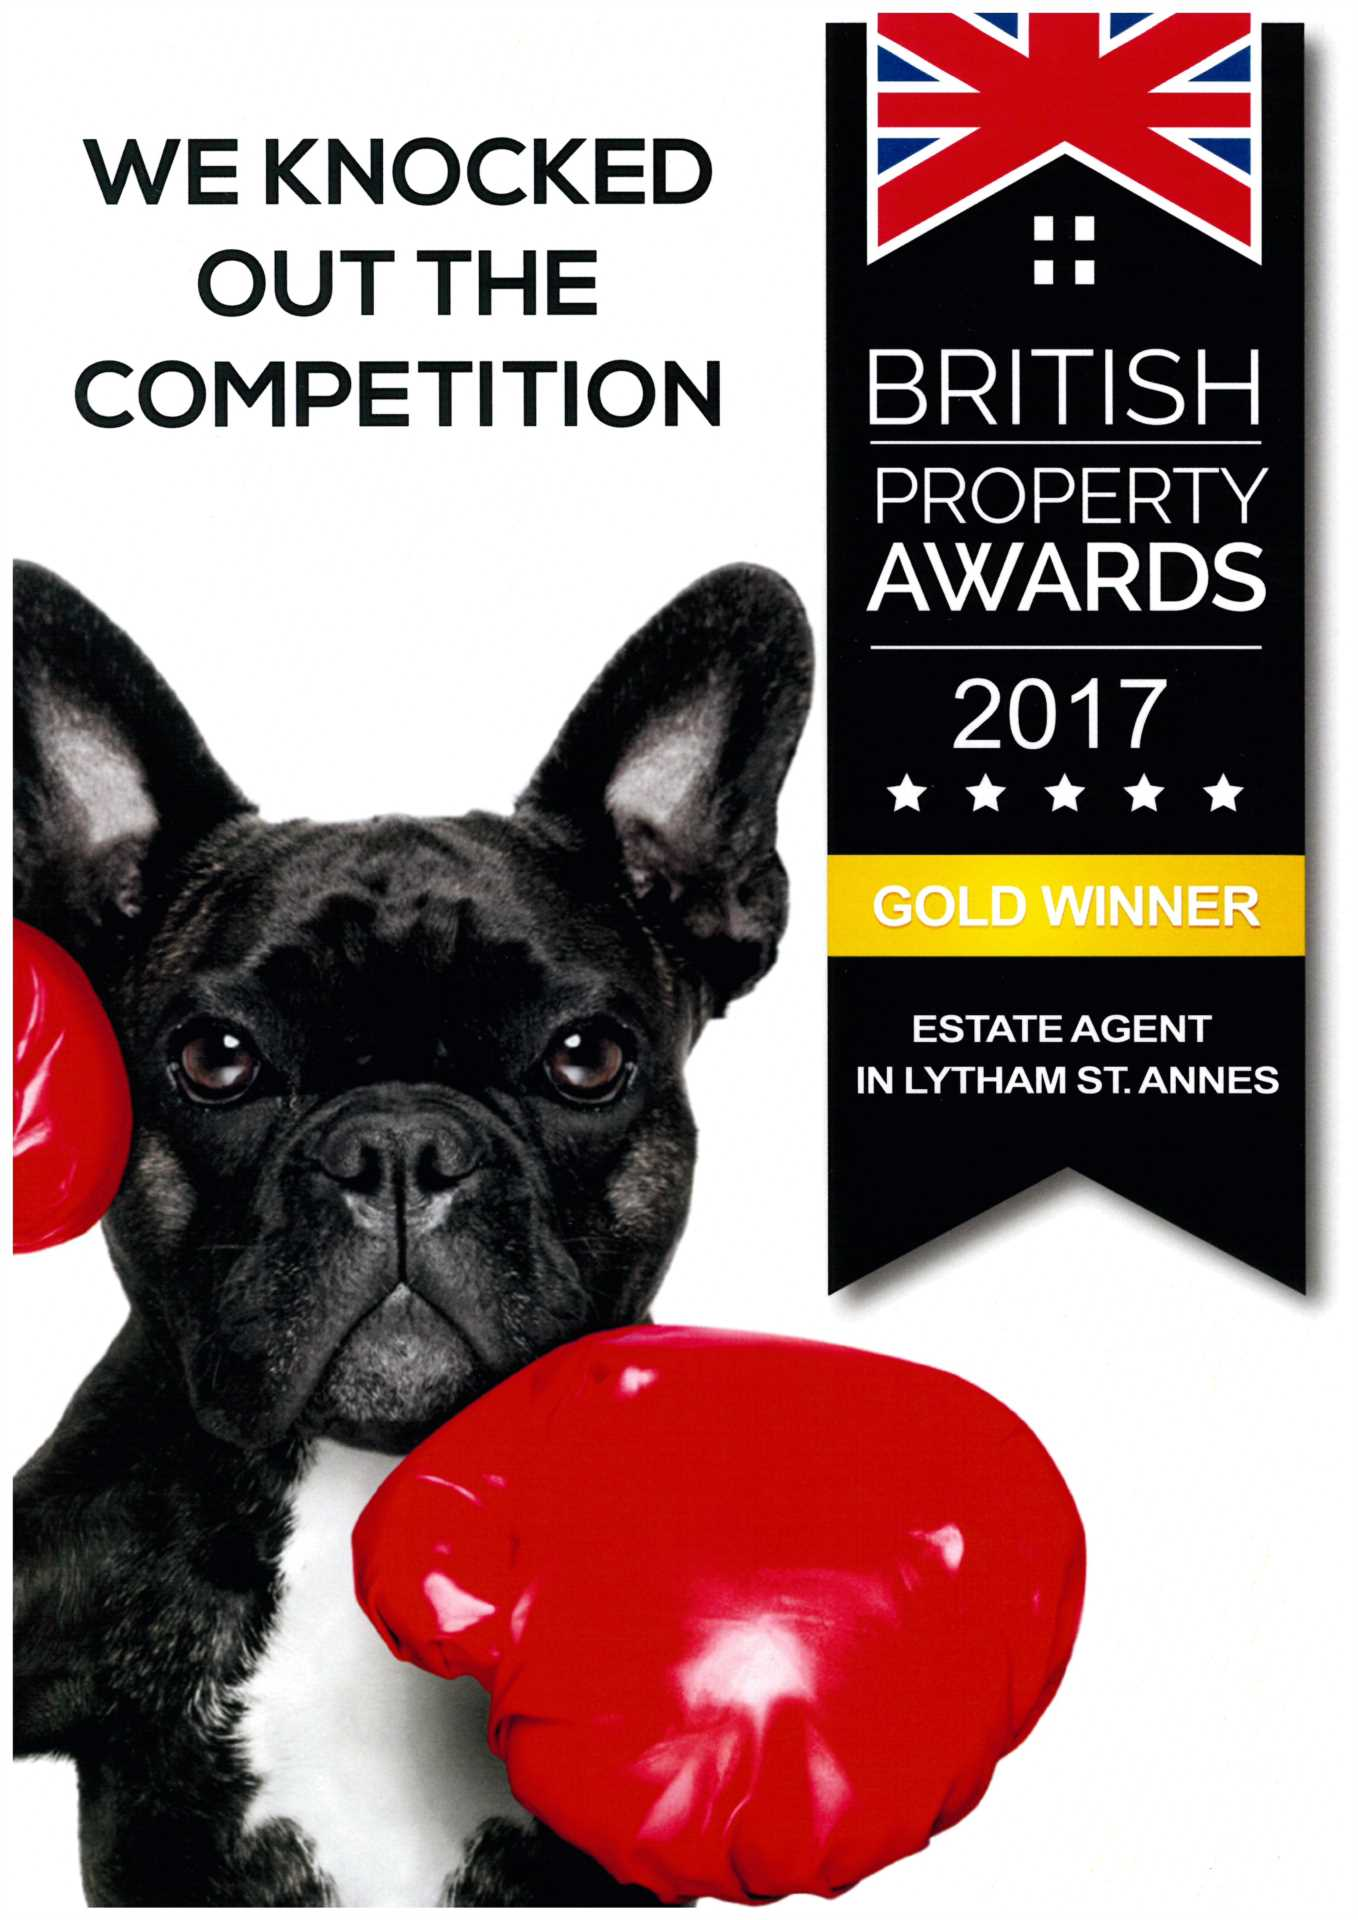 British Property Awards Winners 2016 and 2017